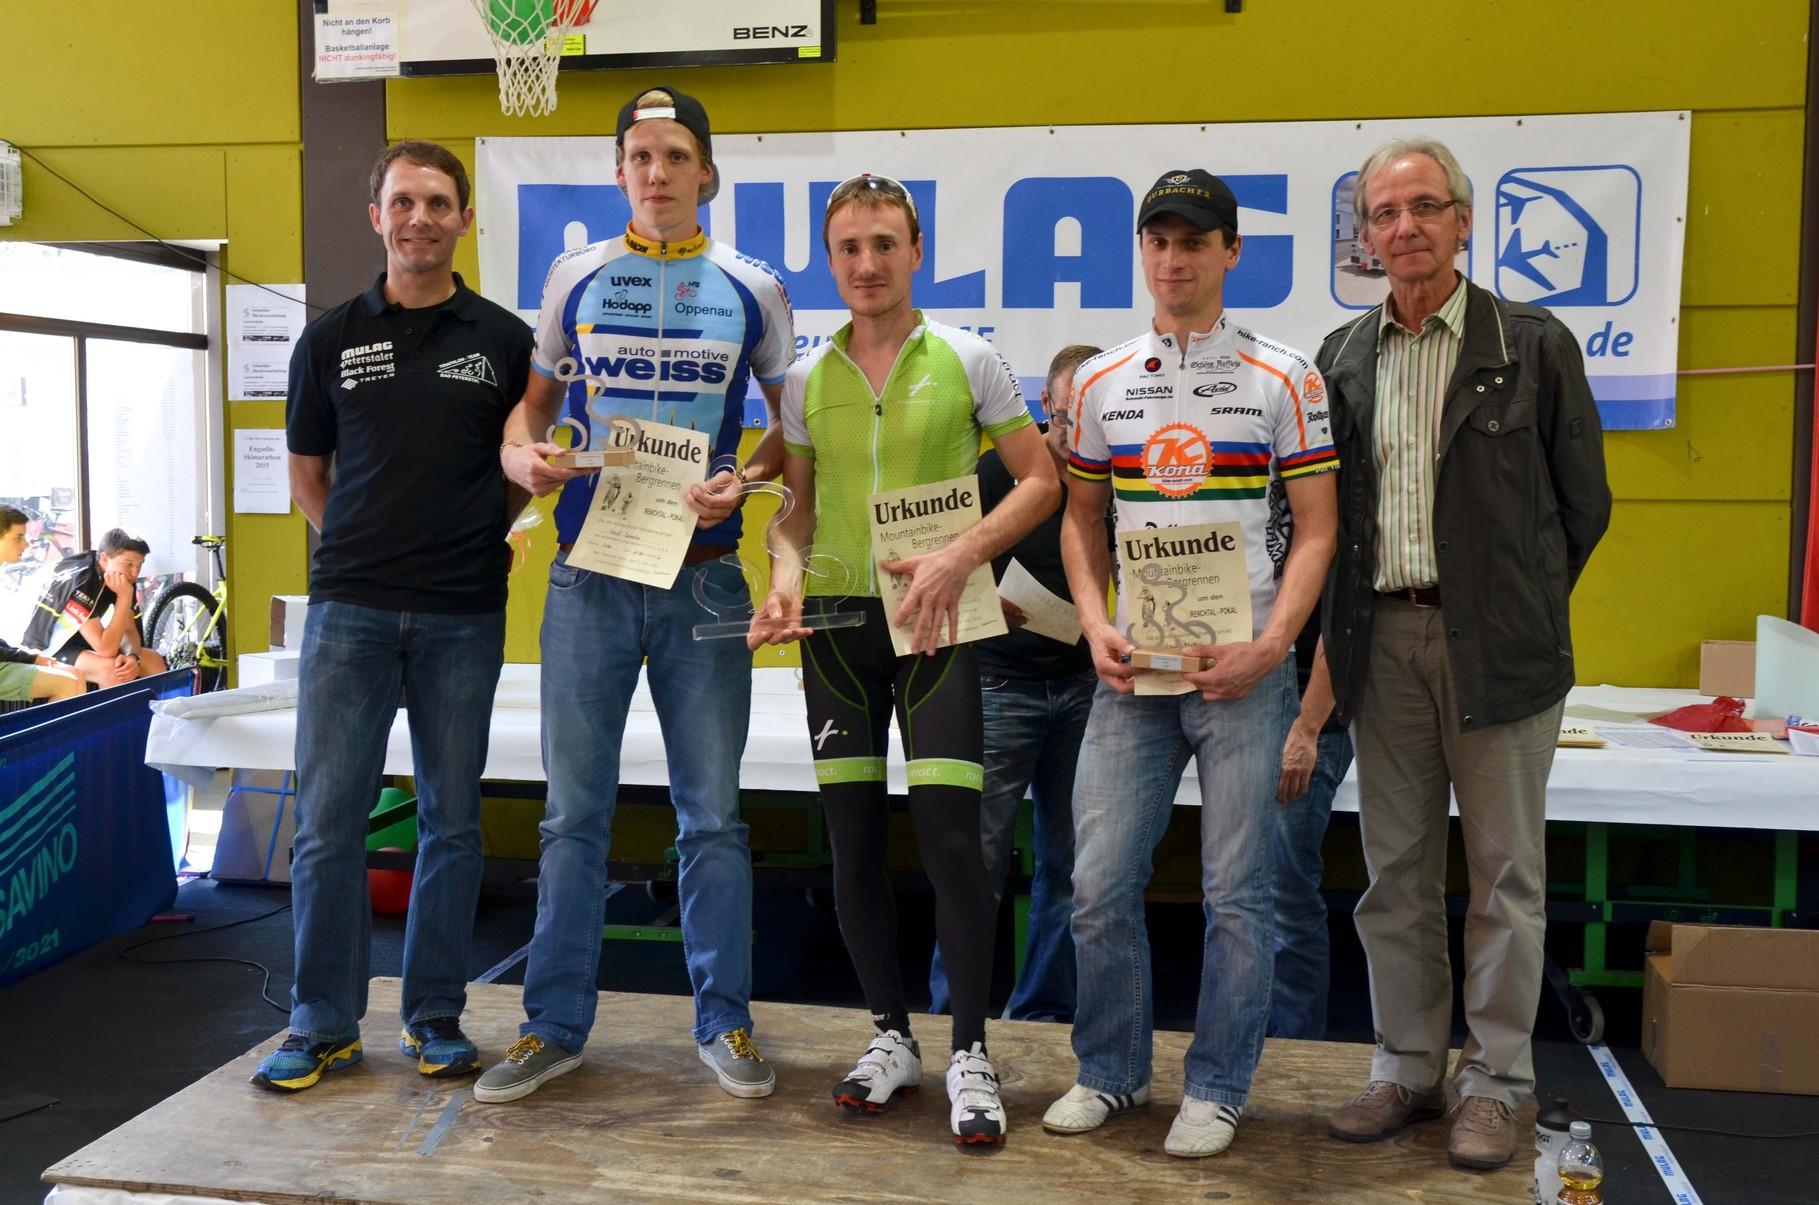 Hodapp Oppenau sonstige rennen 2014 mtb team oppenau powered by volvo